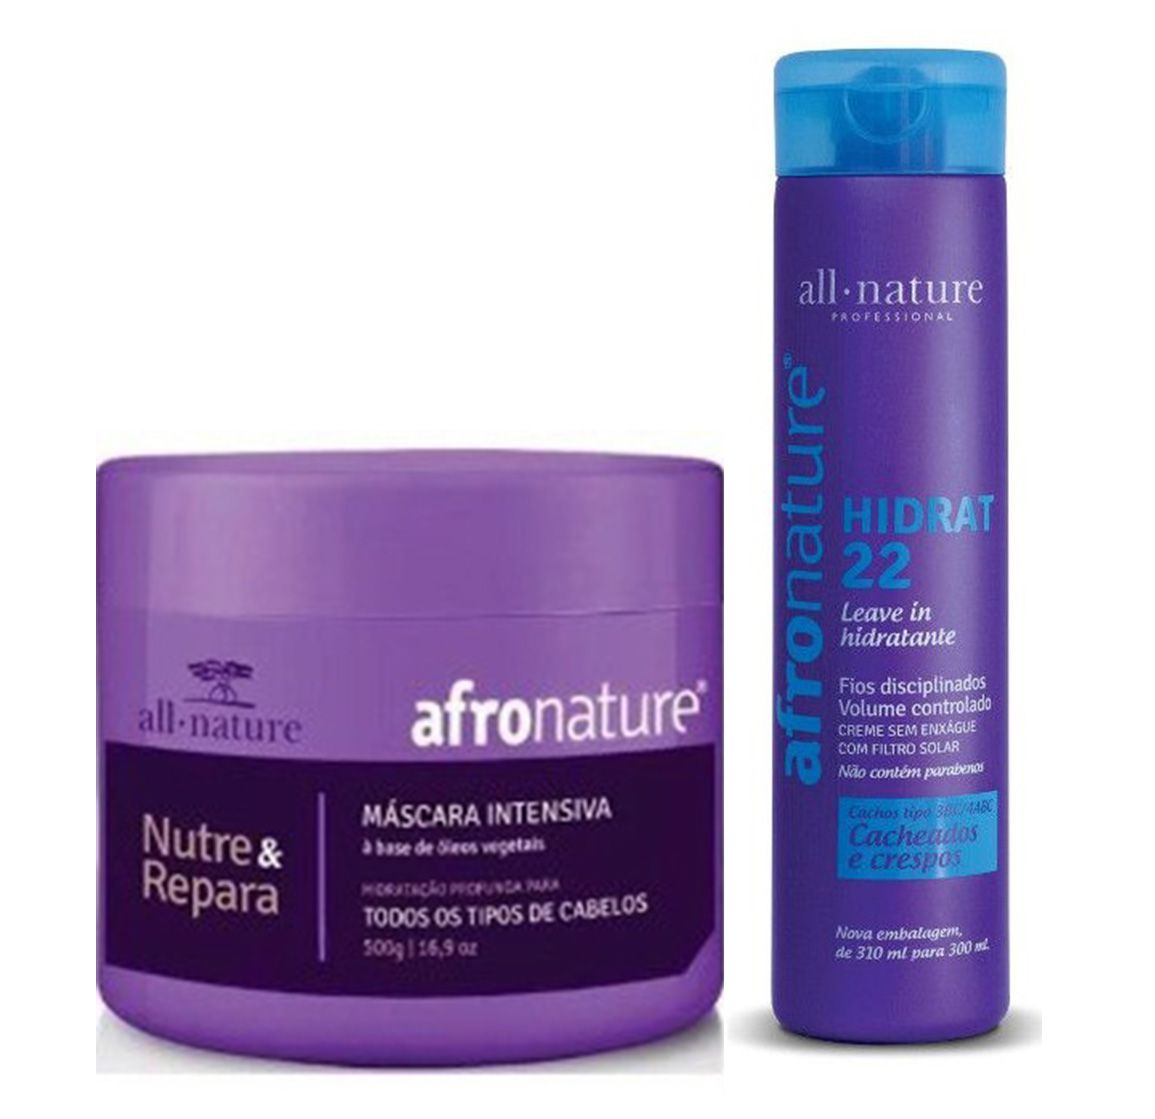 Mascara Capilar Intensiva + Hidrat 22 Leave In Creme Para Pentear All Nature